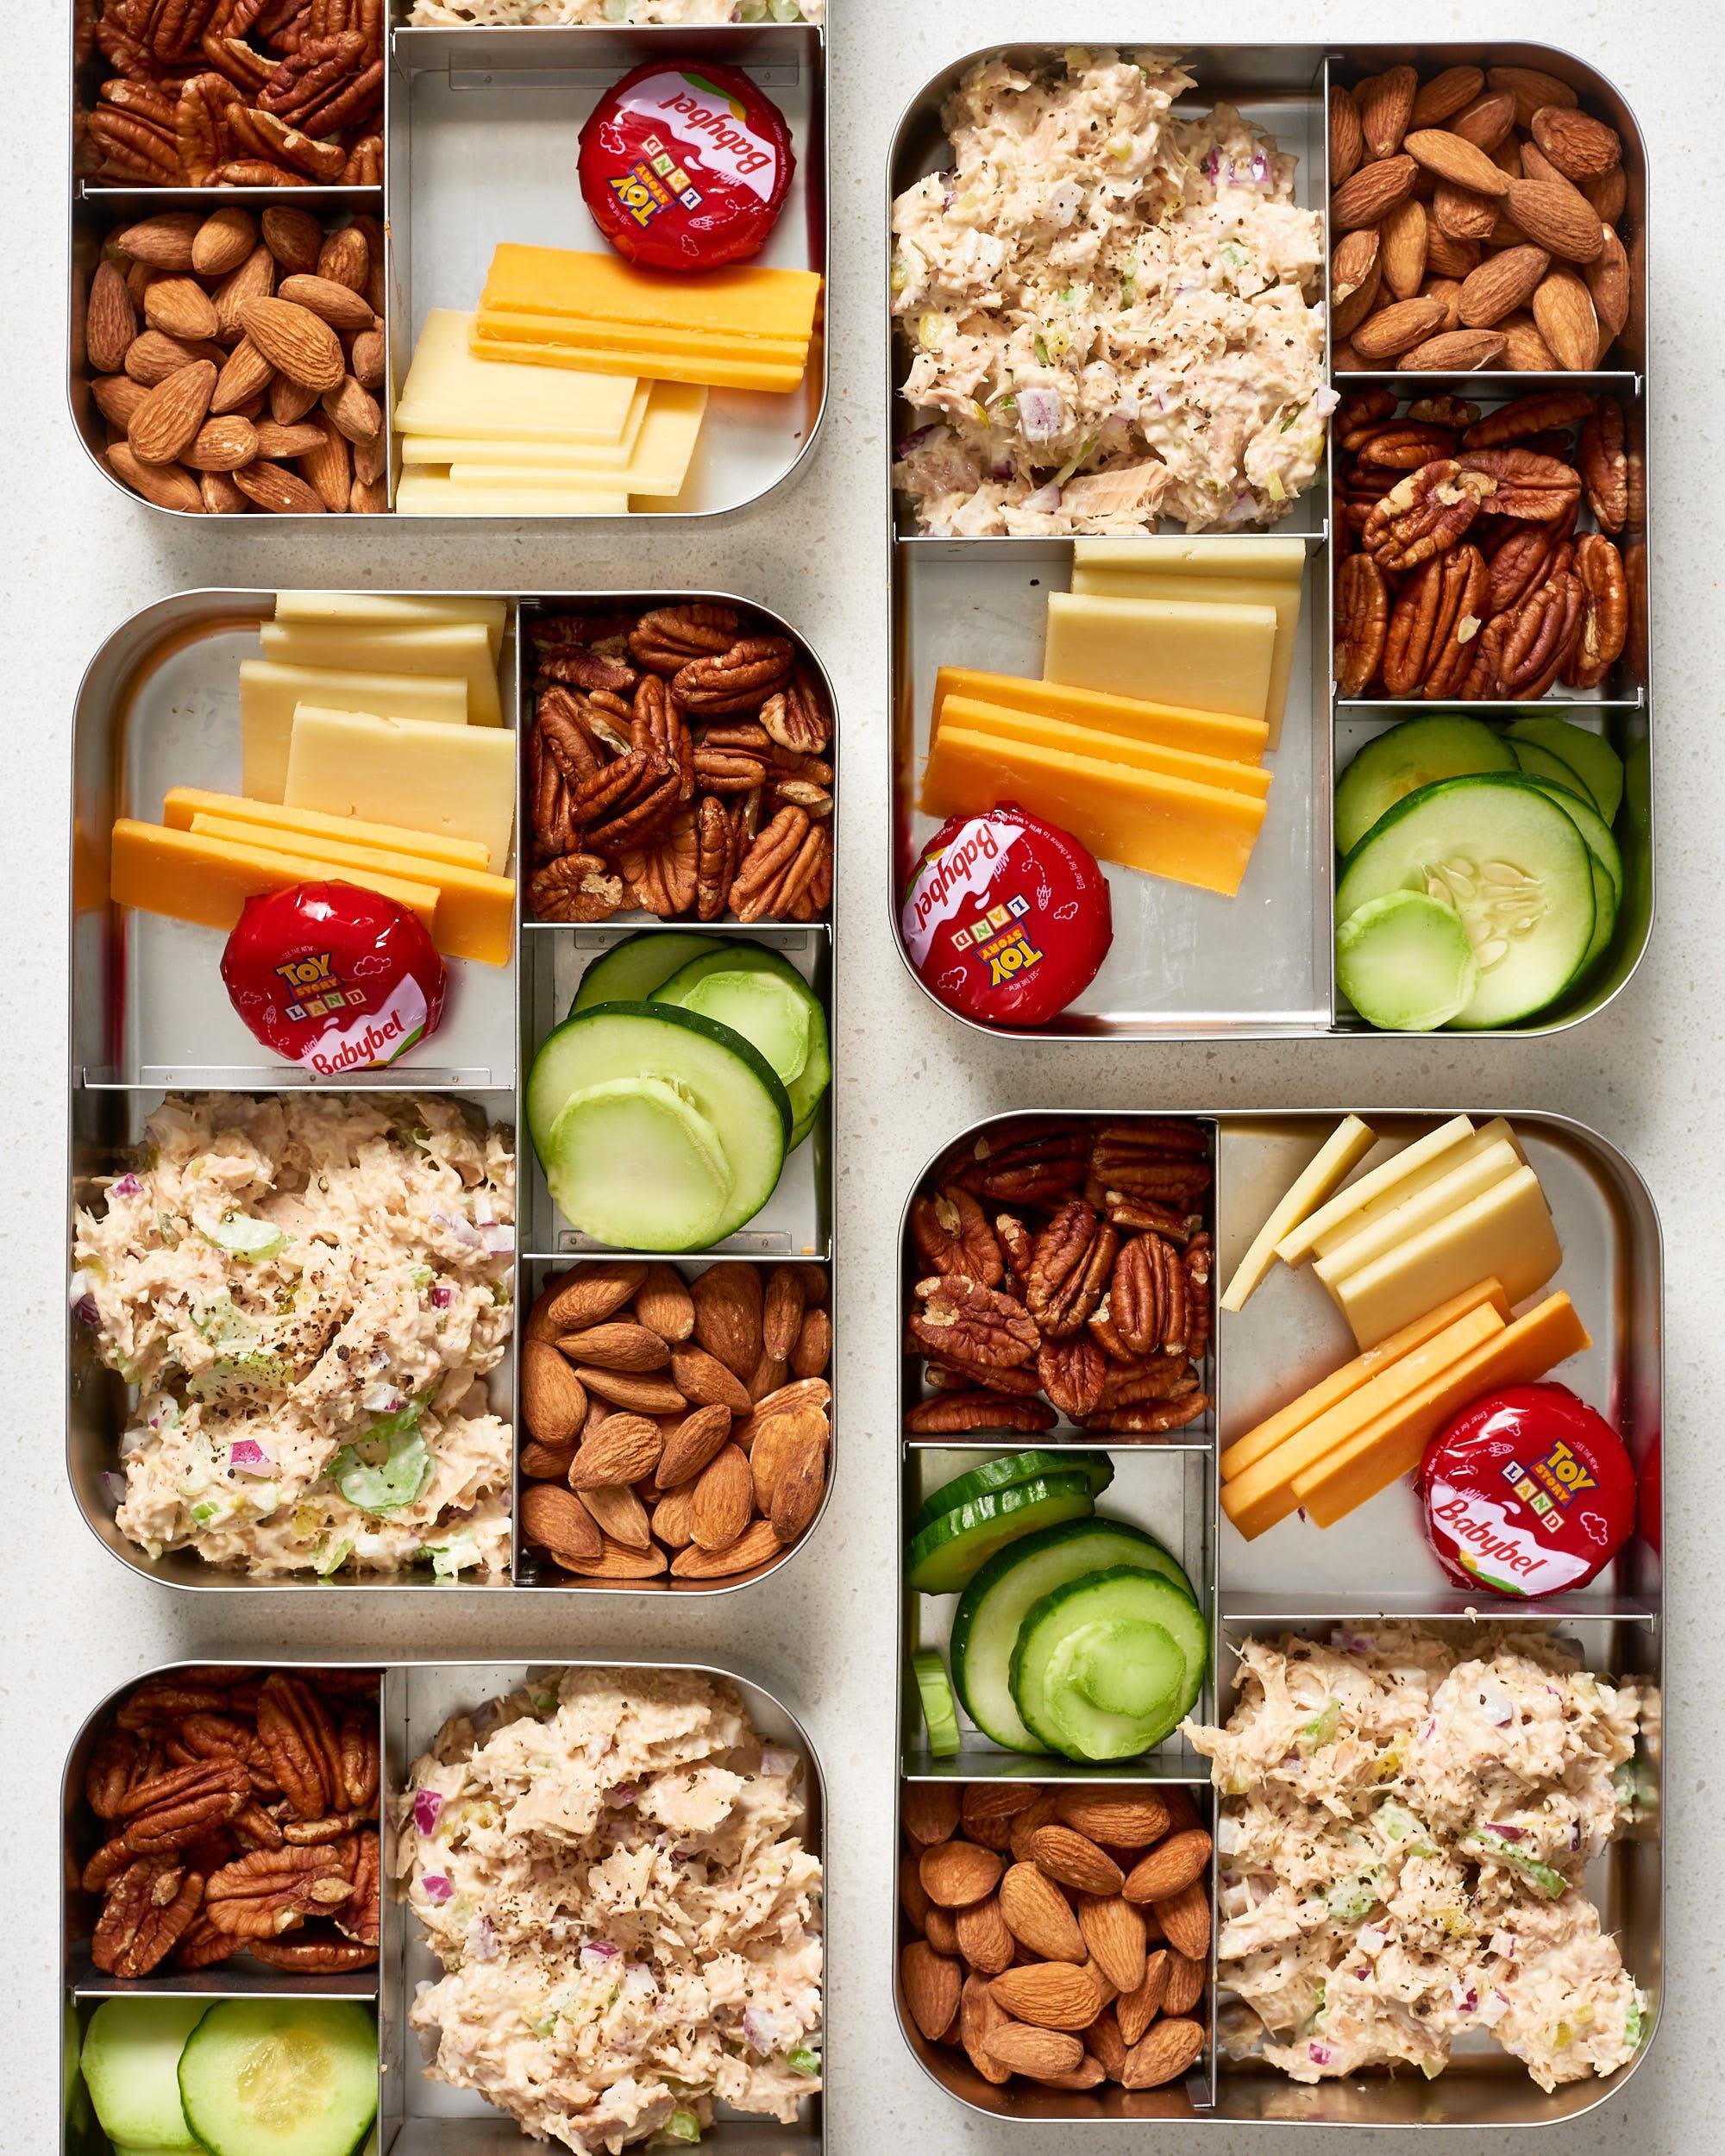 Keto Diet For Beginners Week 1 Meal Plan Recipes  Fast Keto Meal Prep in Under 2 Hours